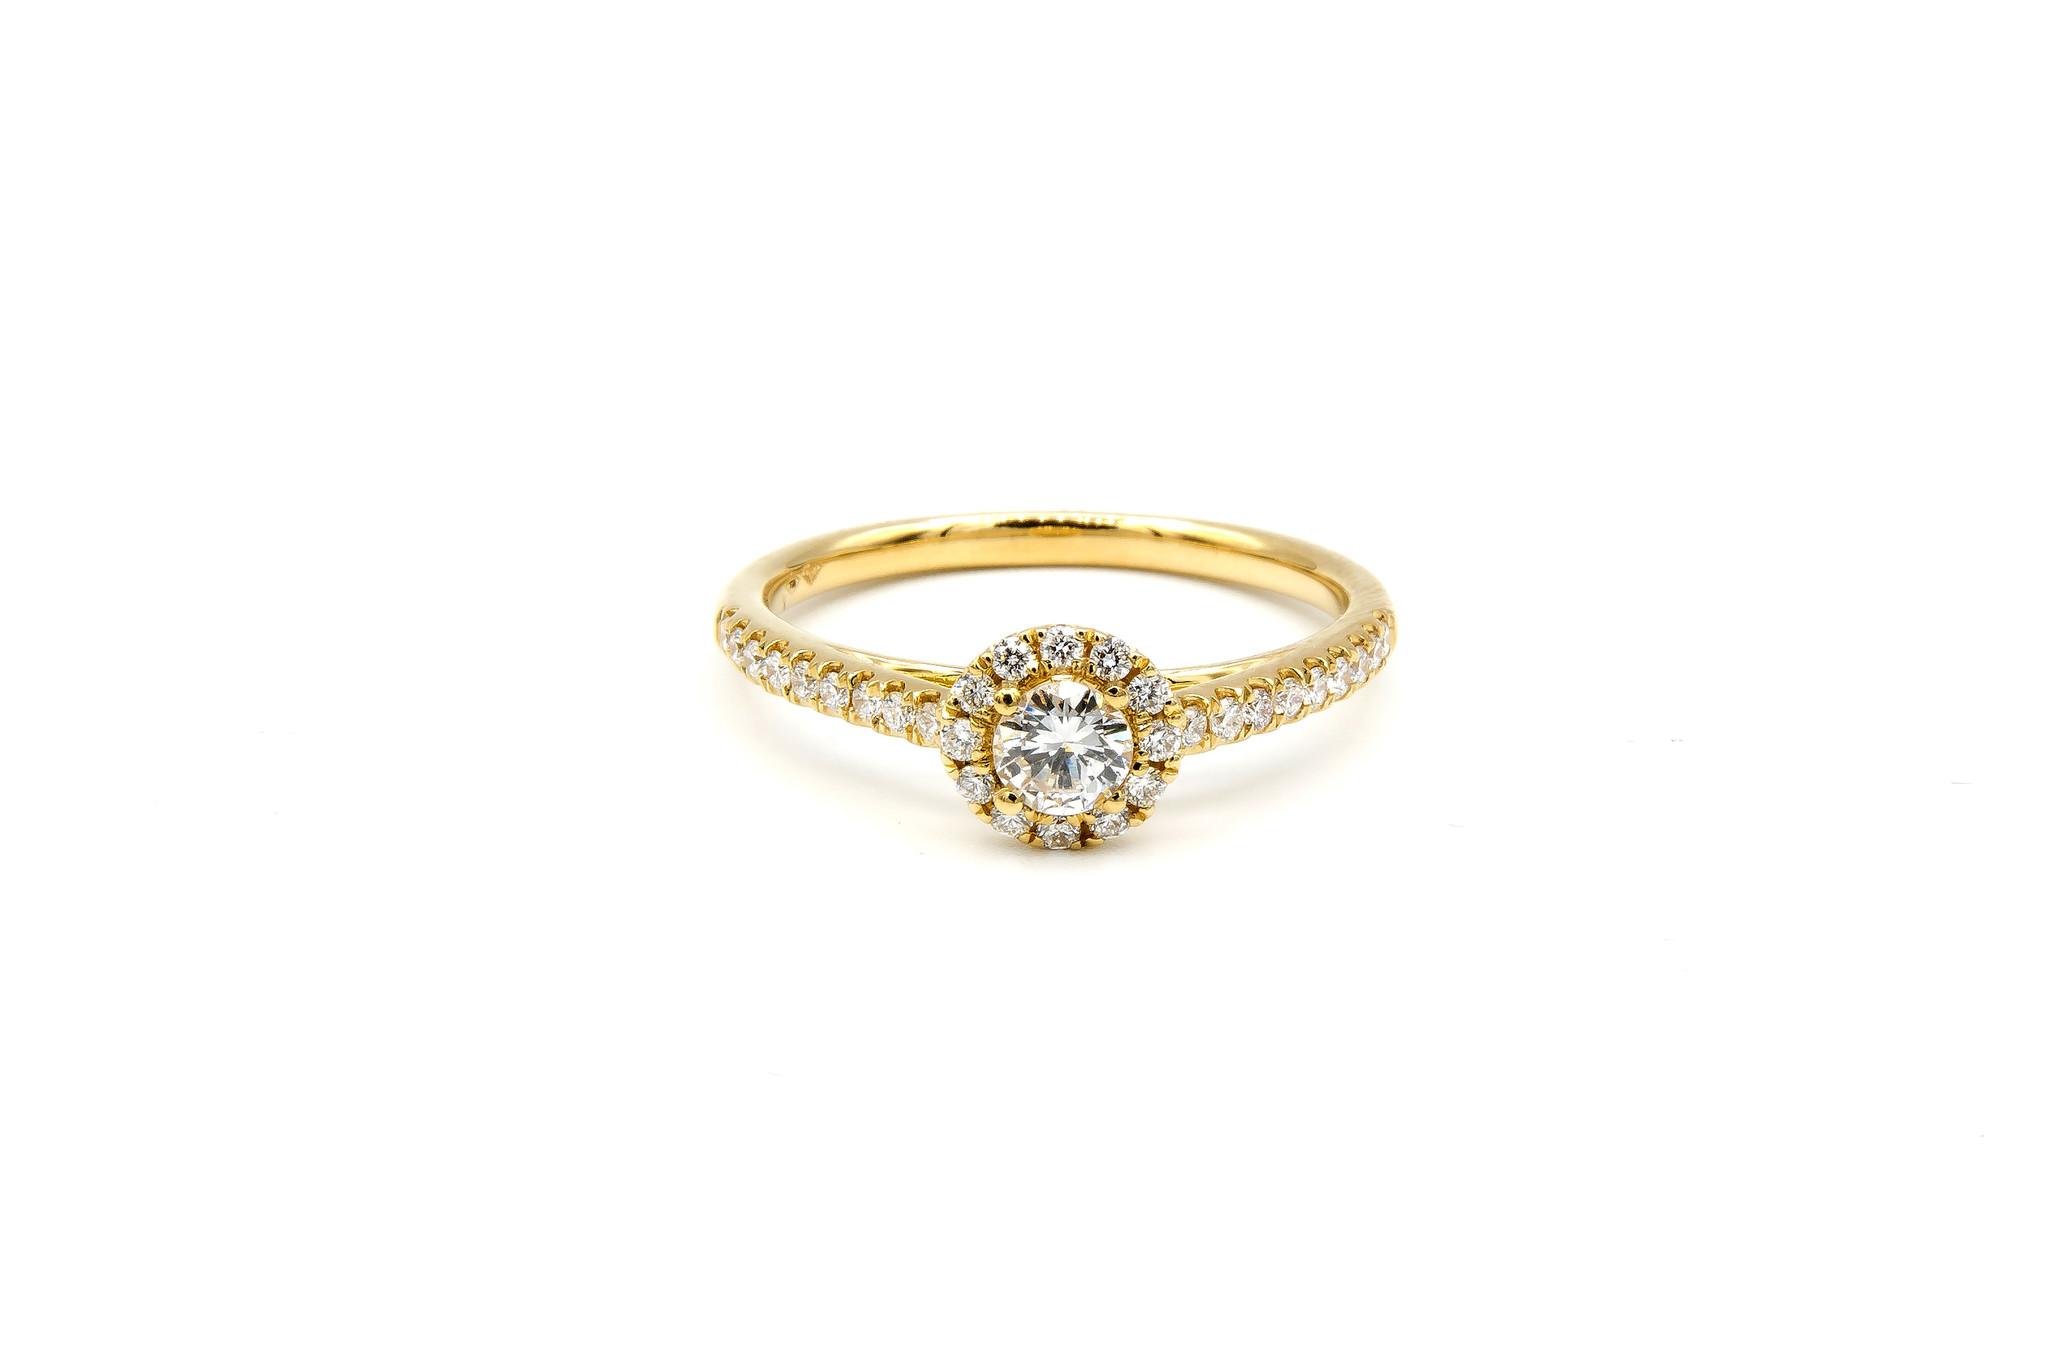 Ring verlovingsring met 0,3 ct VS en 0,26 ct VS diamant-1